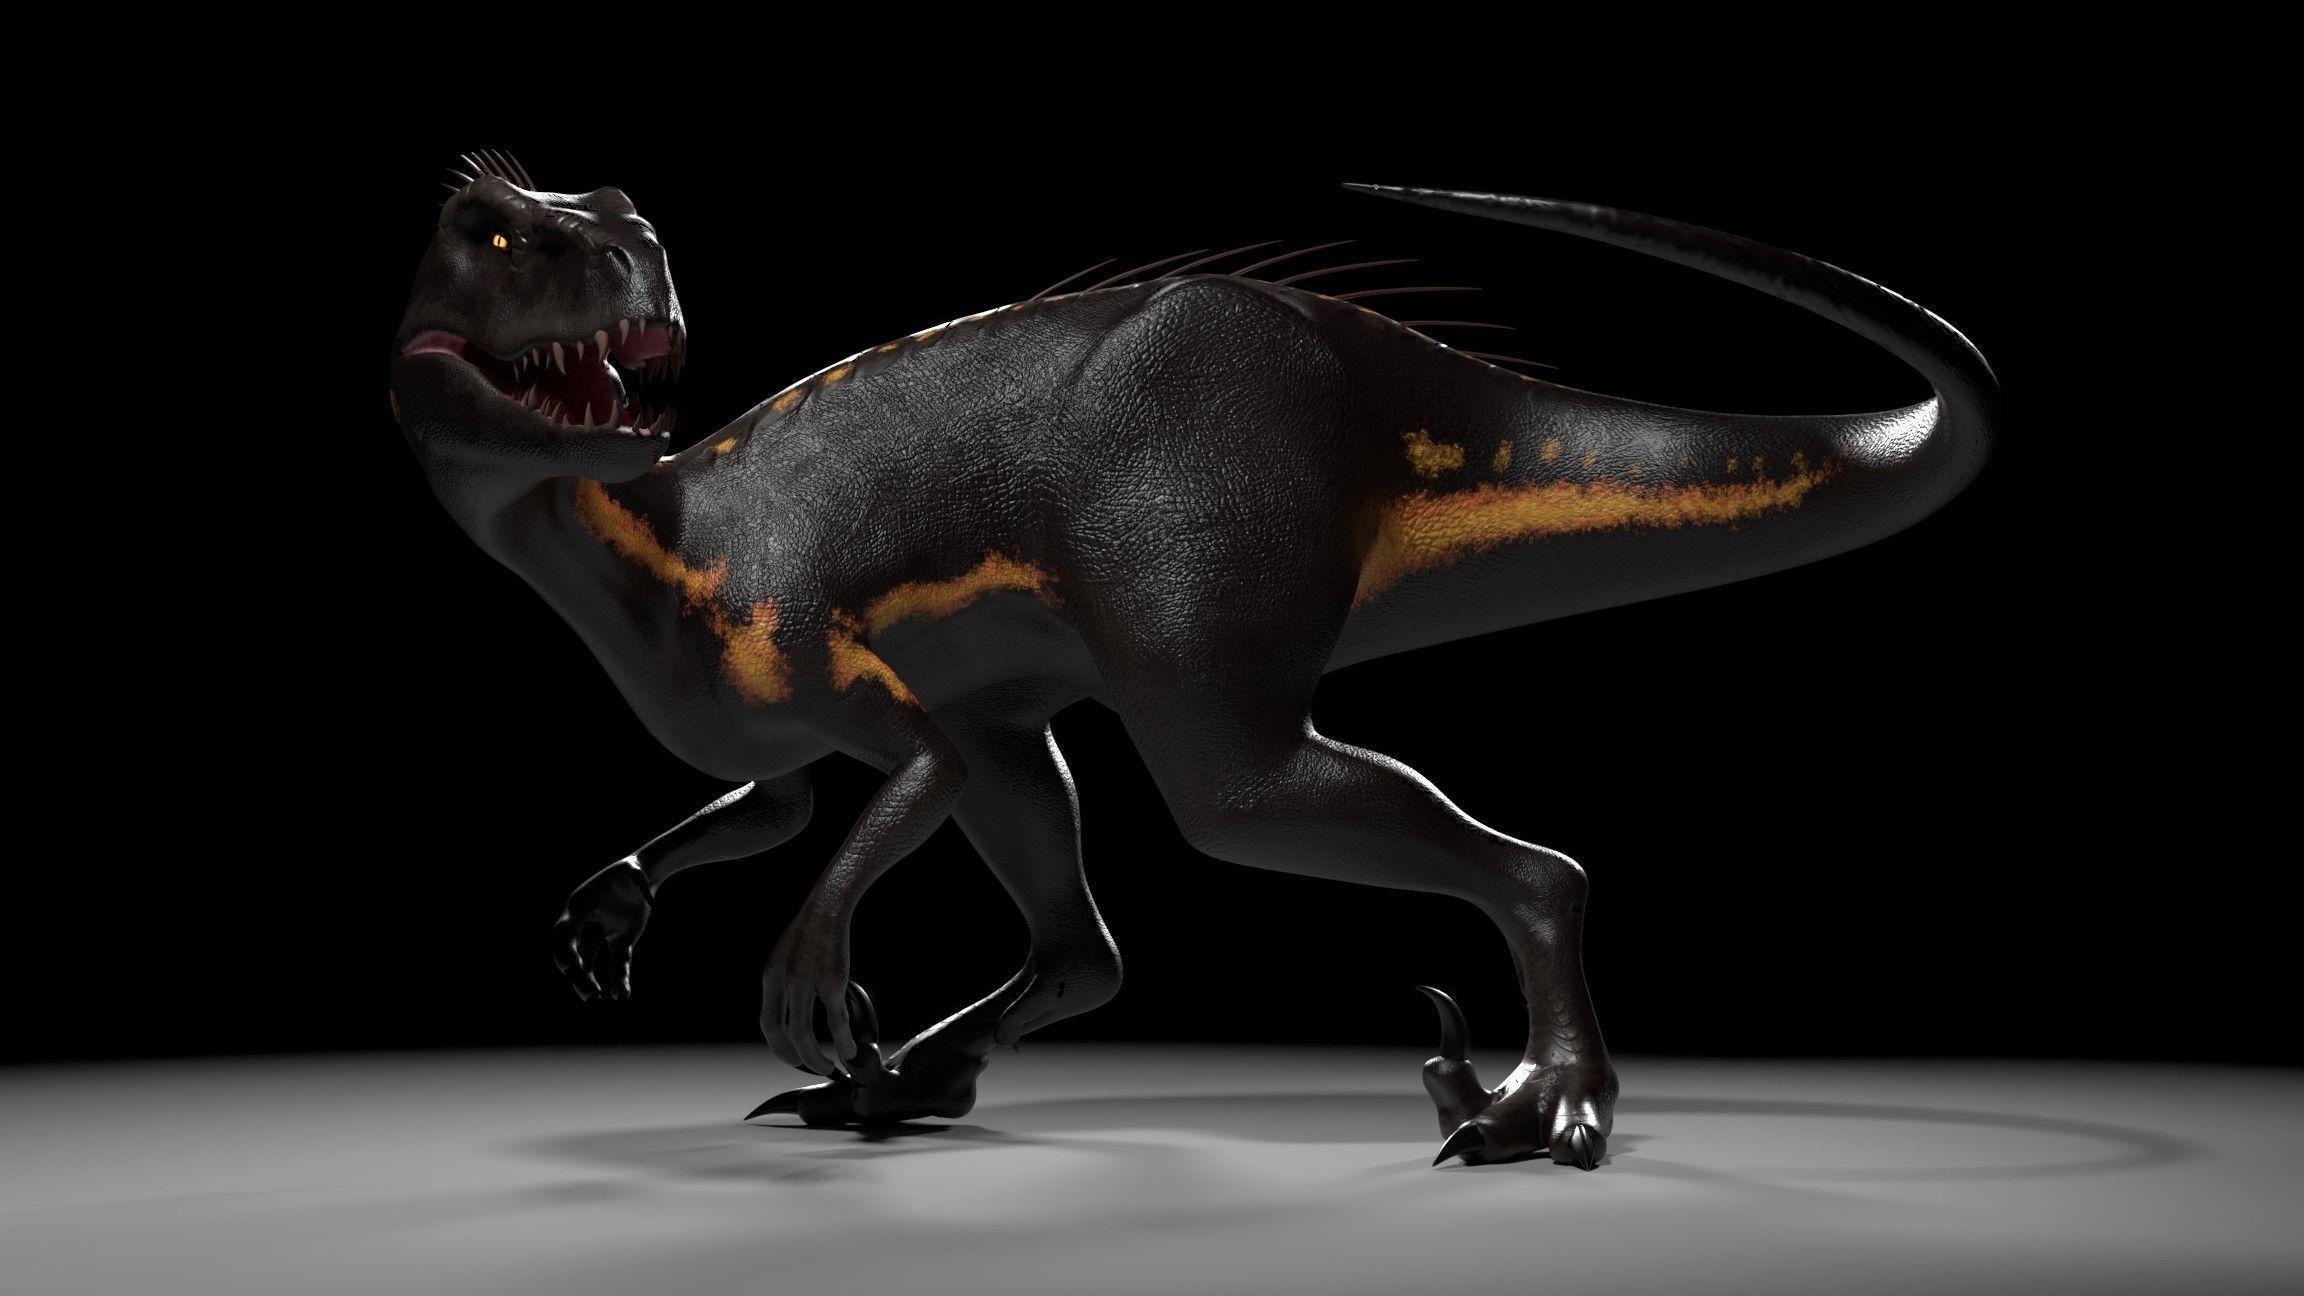 Dinosaur Build Roblox Studio Indoraptor - All Working ...